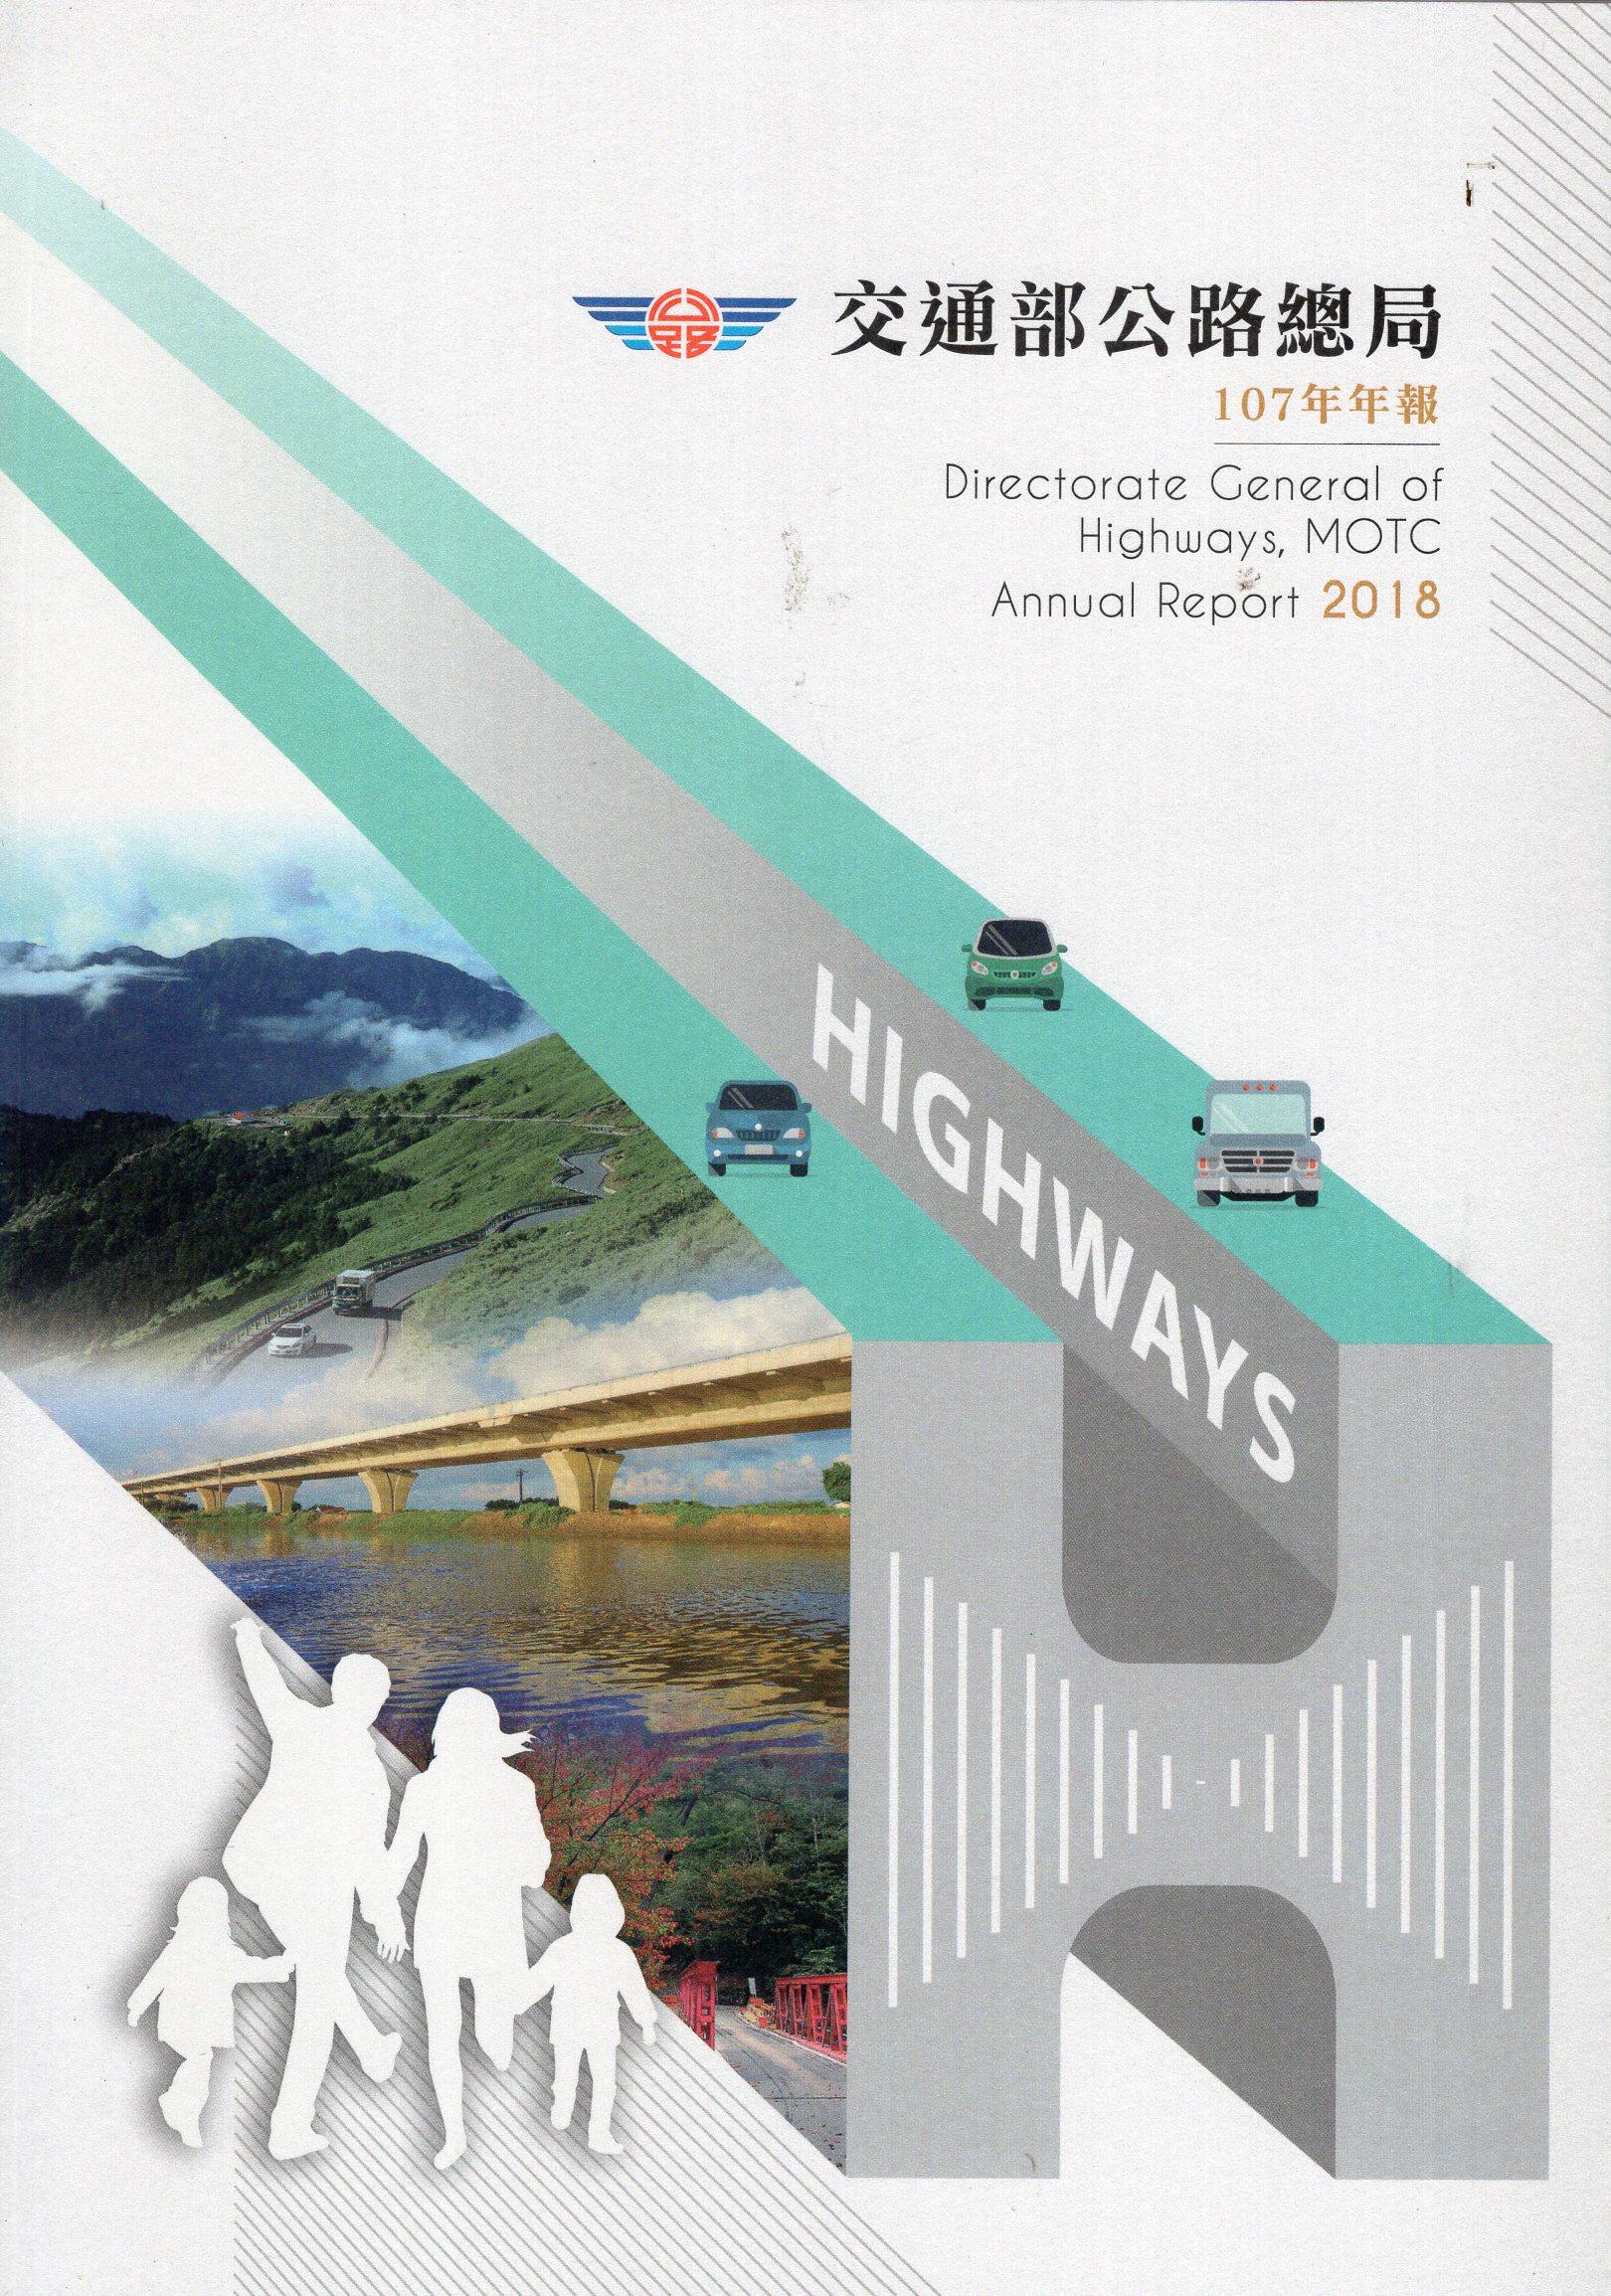 2018 Annual Report of Directorate General of Highways, MOTC